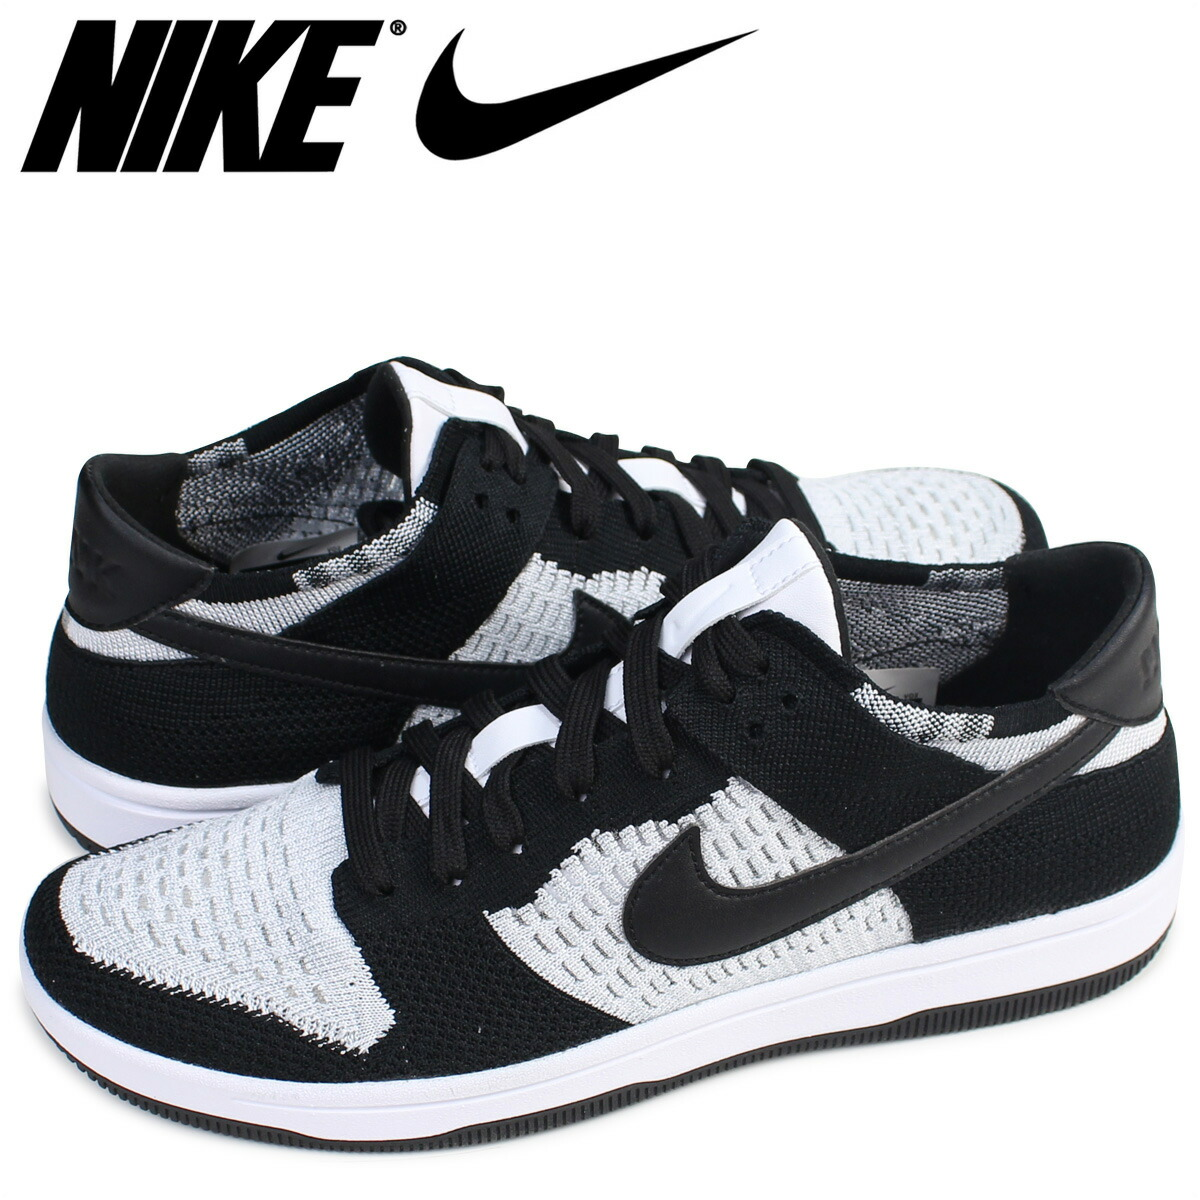 sports shoes 3b5b9 4f256 Nike Dunk High Flyknit Sneakers Women